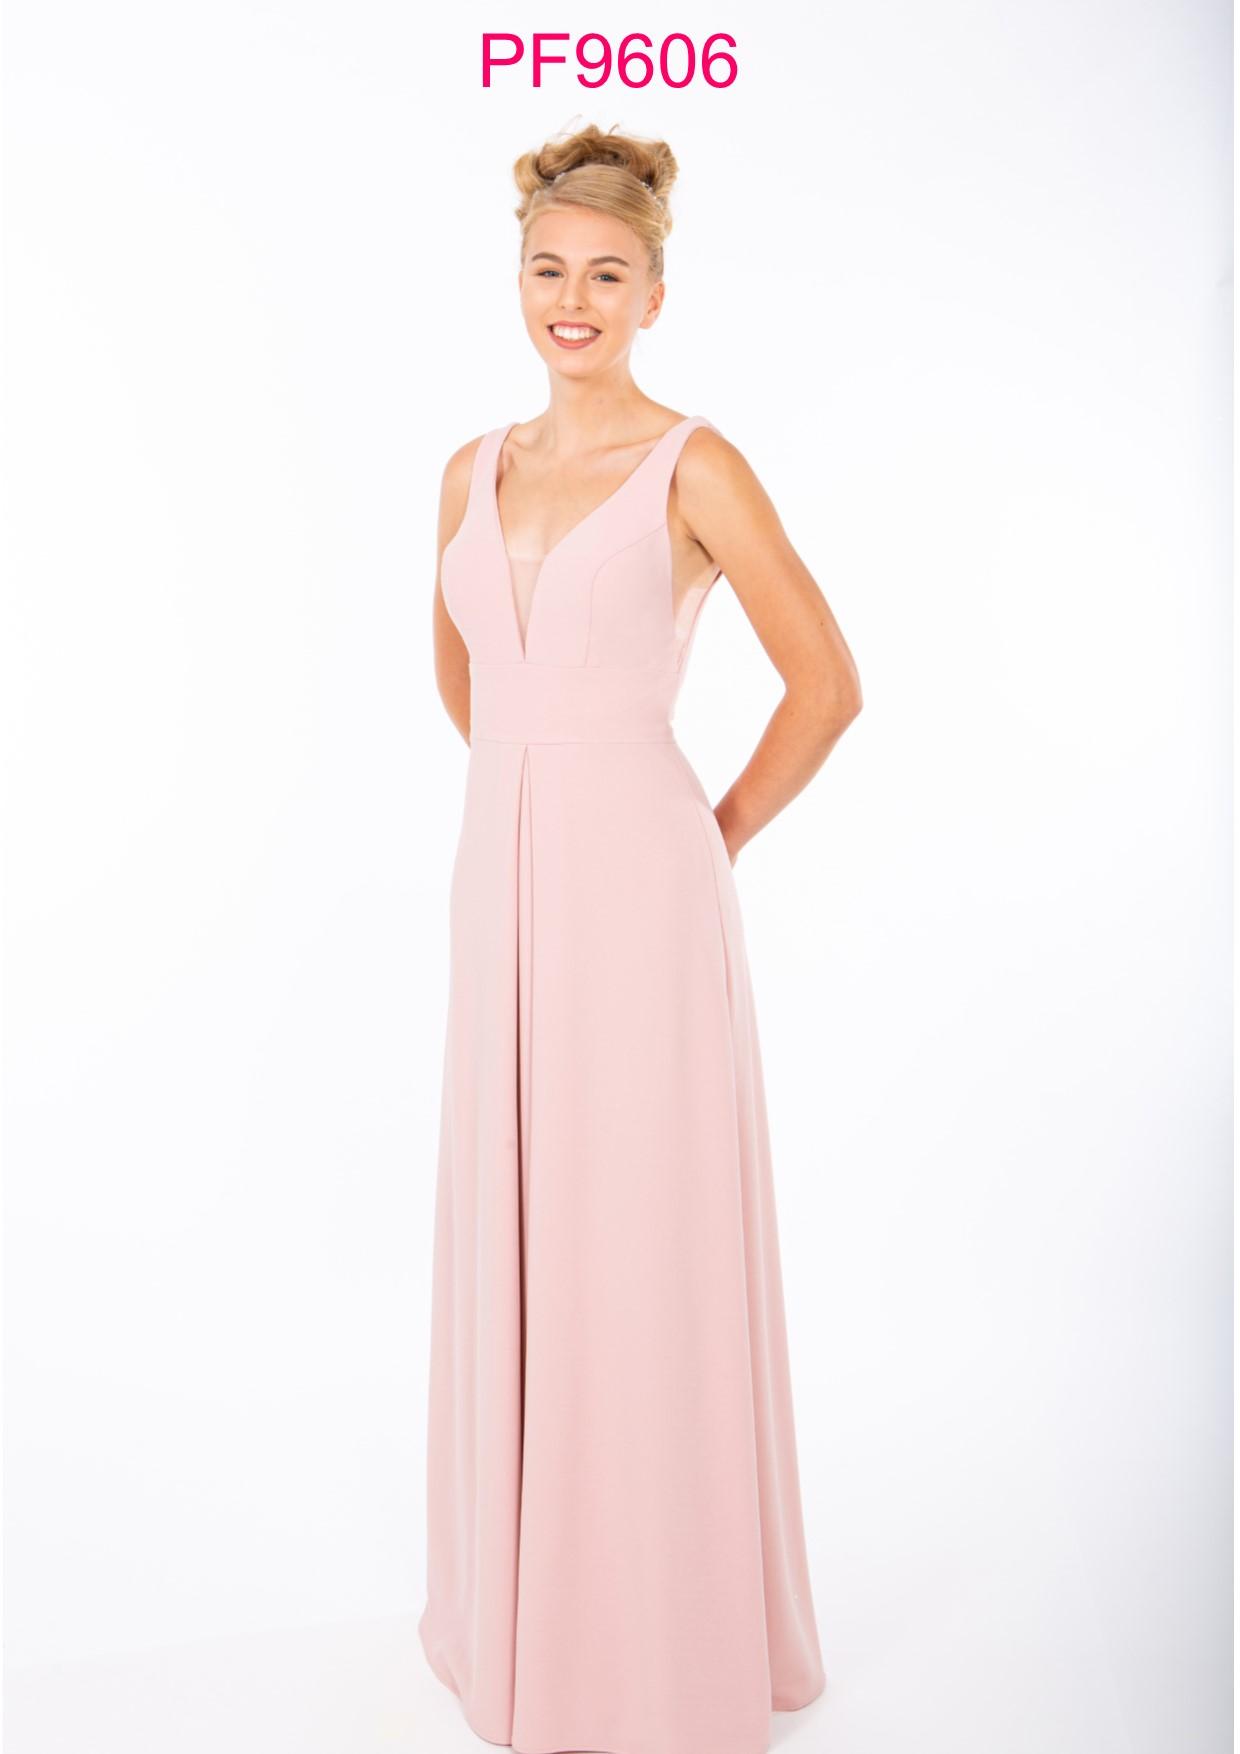 PF9671 Nude Pink Sparkle Prom Dress - Prom Frocks UK Prom